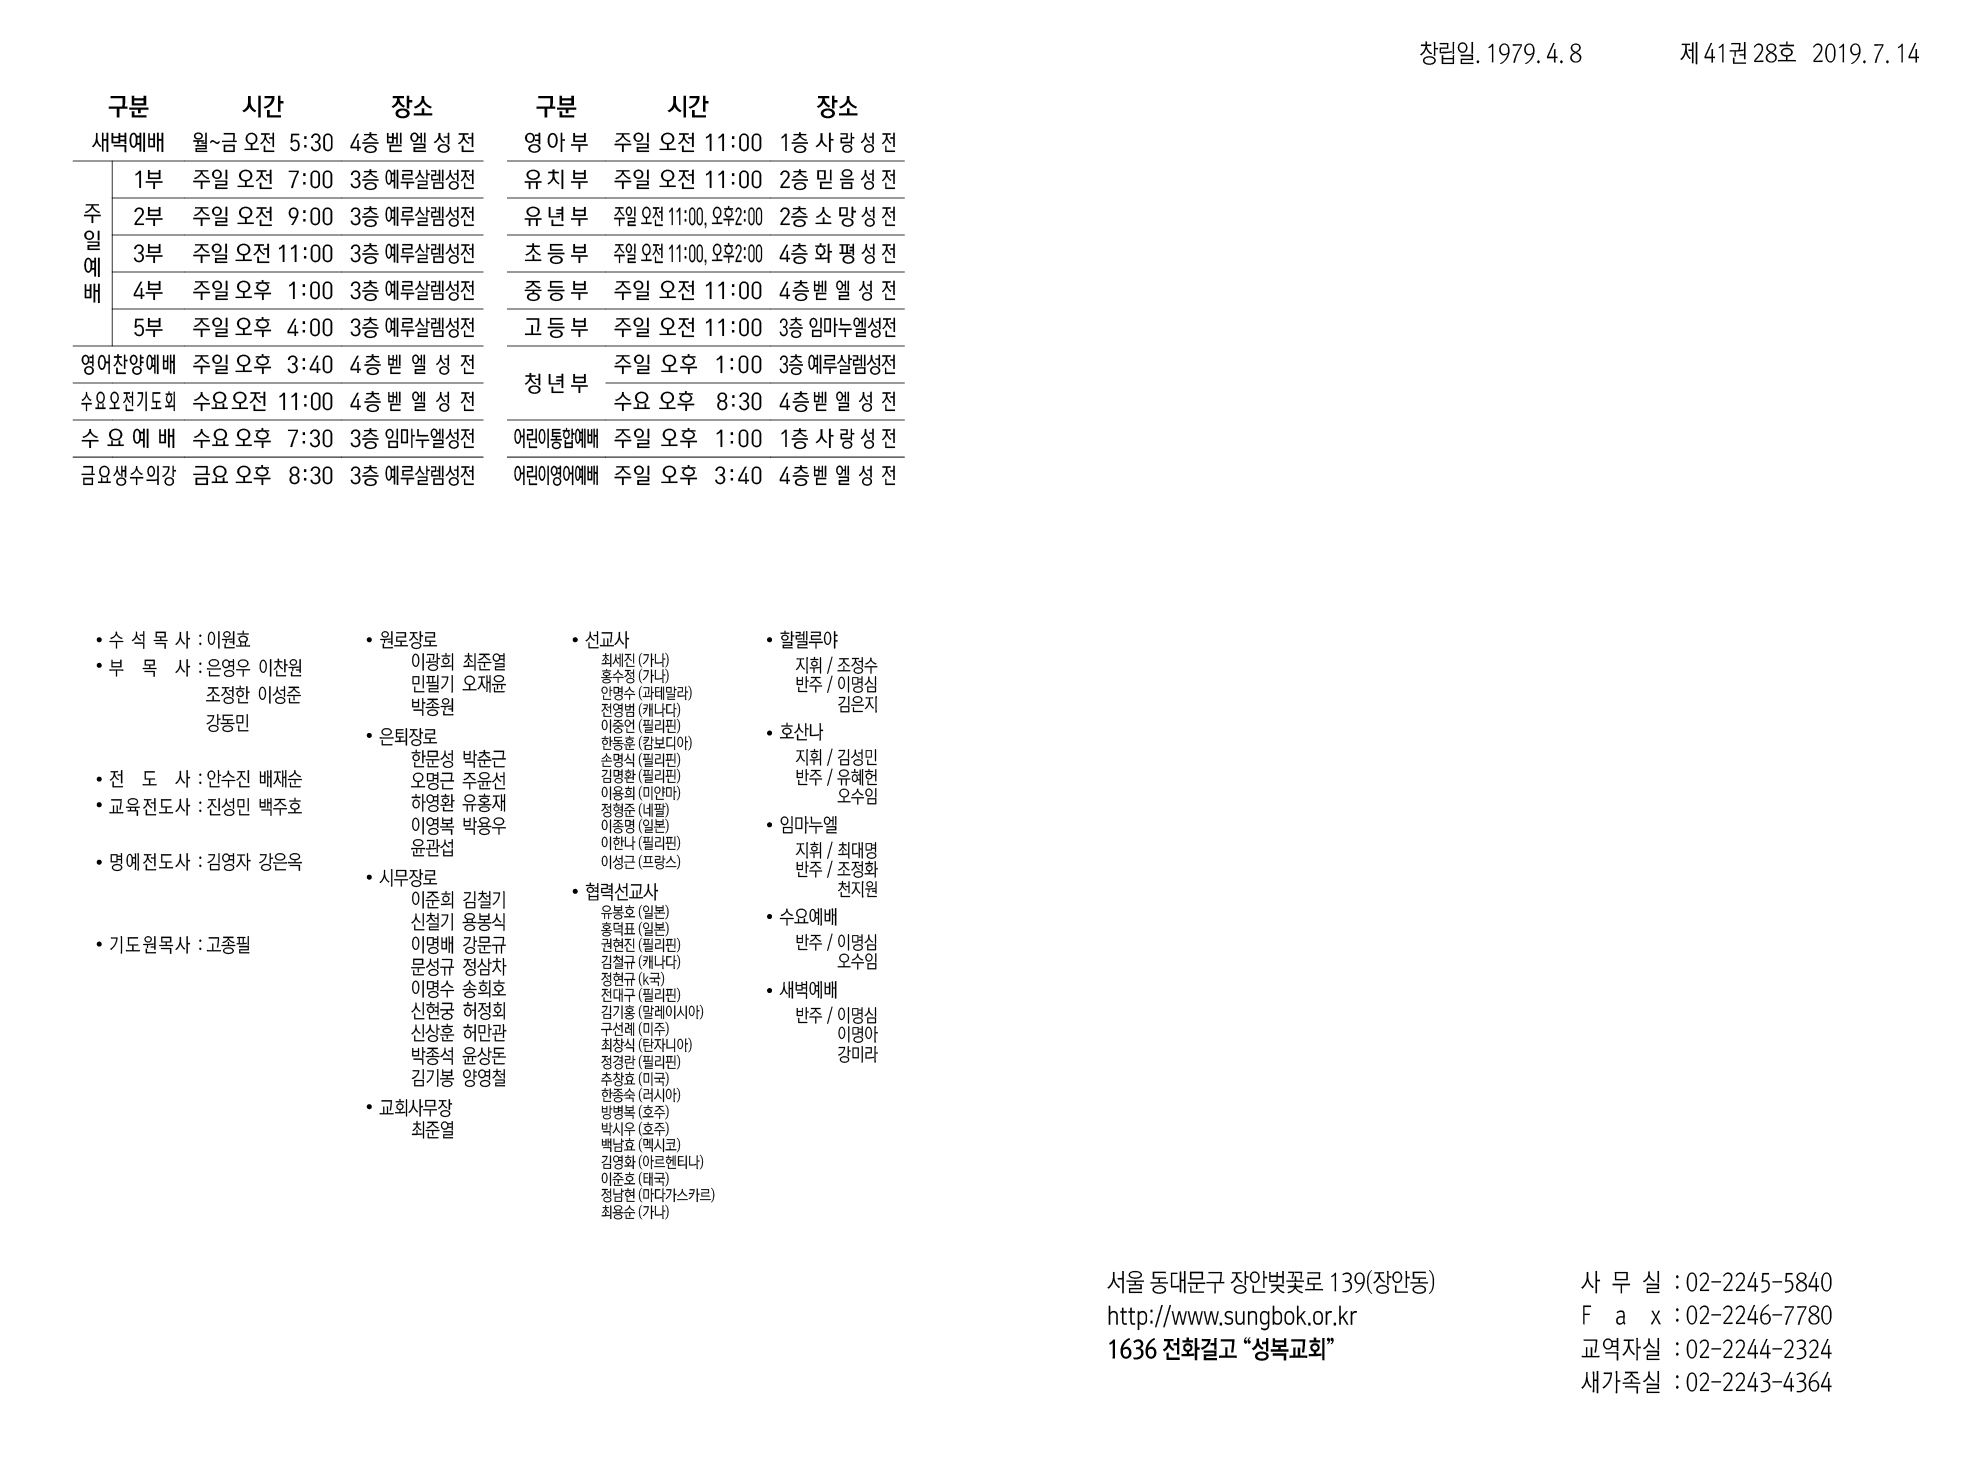 2354e424e2def5264e9a356dbc0f7bc0.jpg